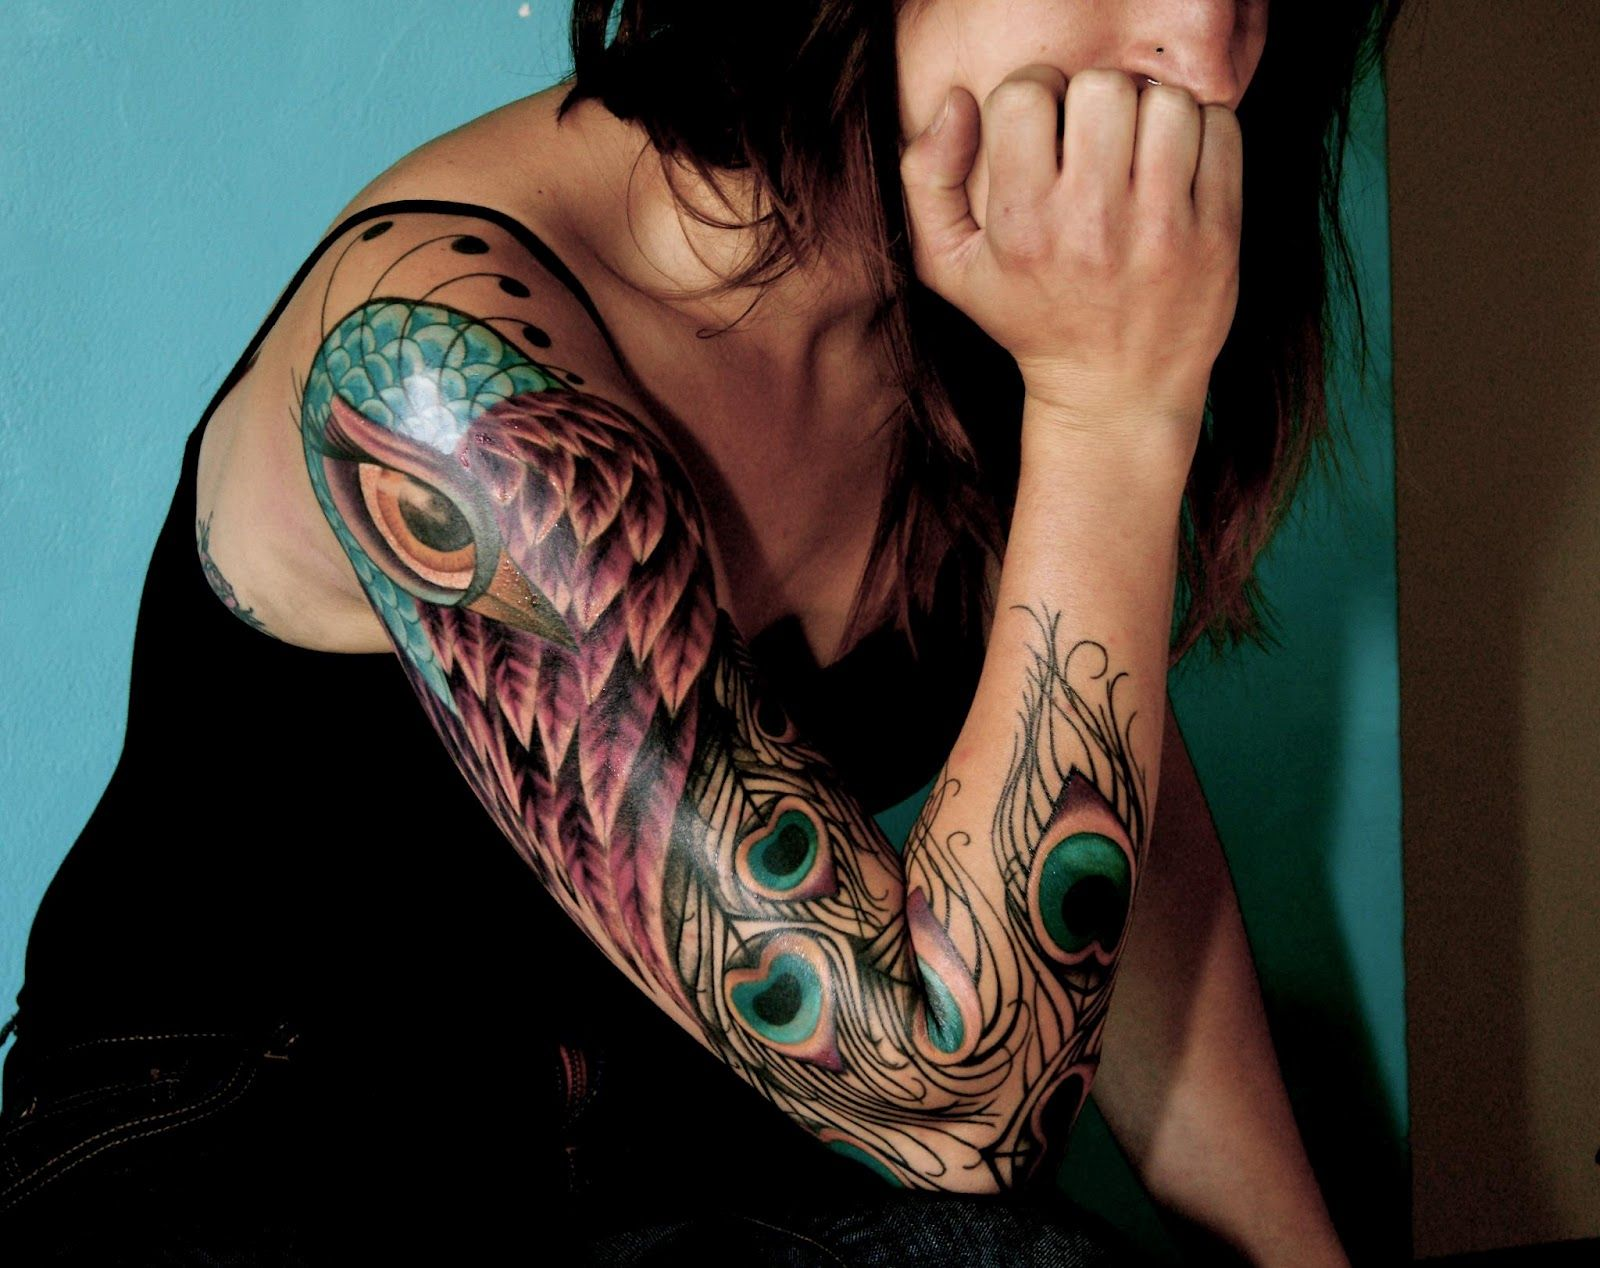 Perfect length tattoos i like pinterest peacocks tattoo and